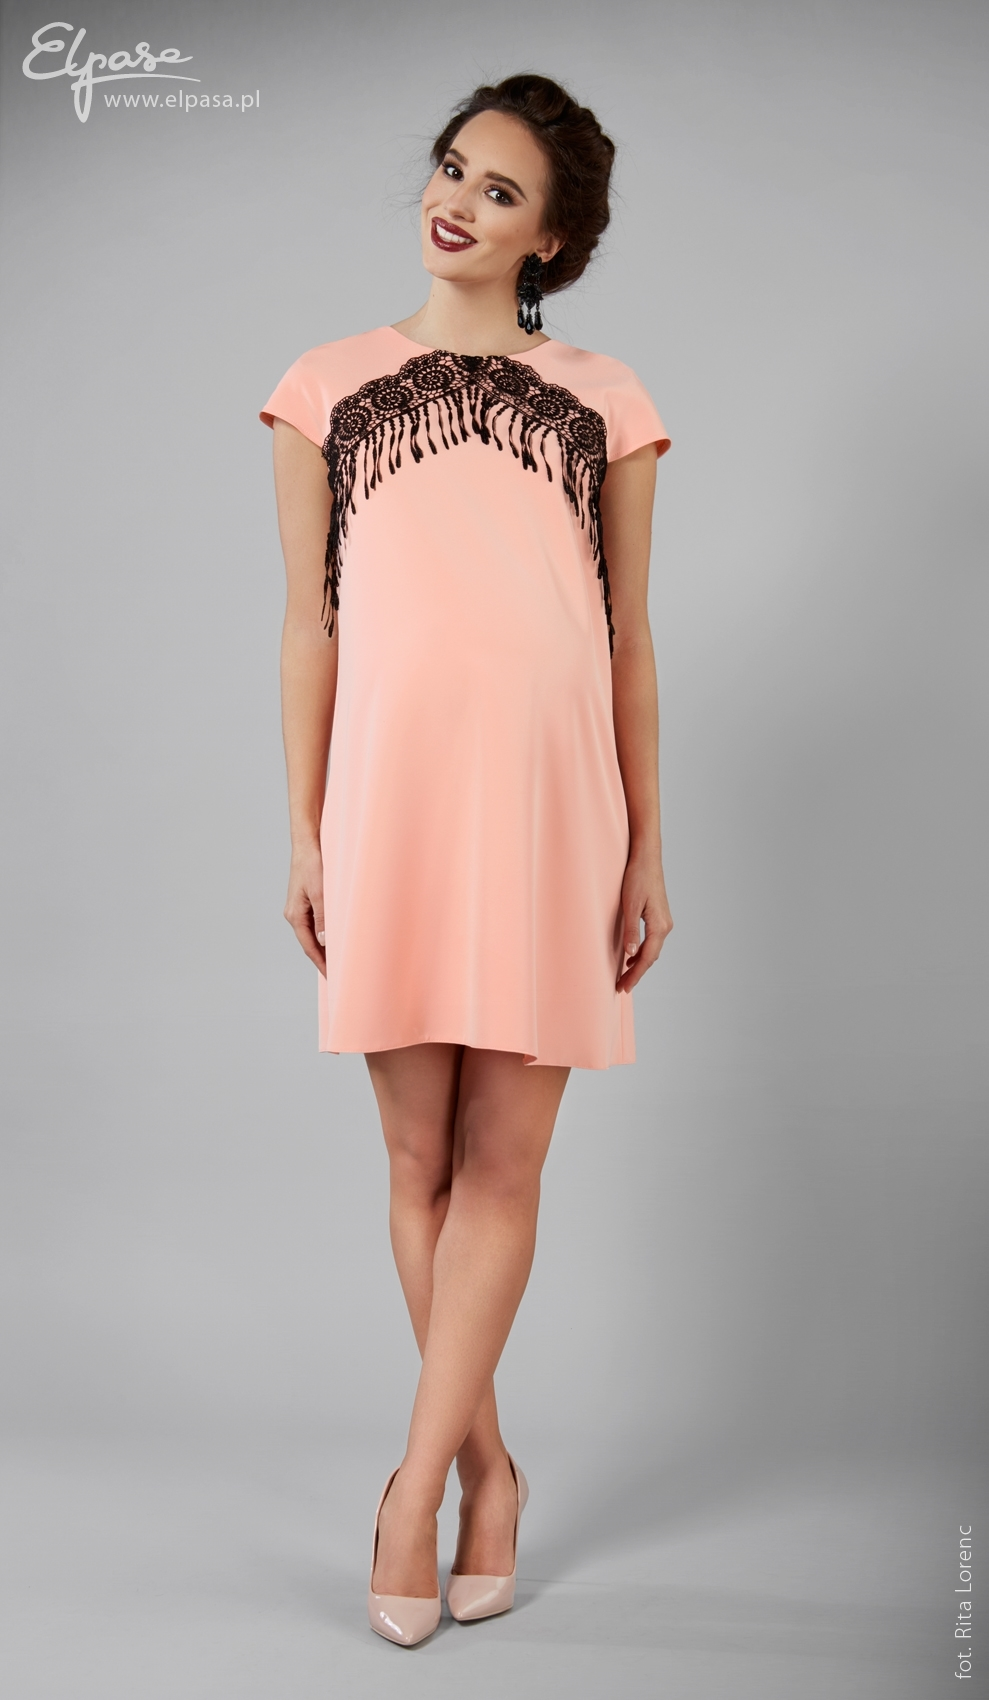 Tehotenské šaty Gisele - ELPASA  7bc6010b664